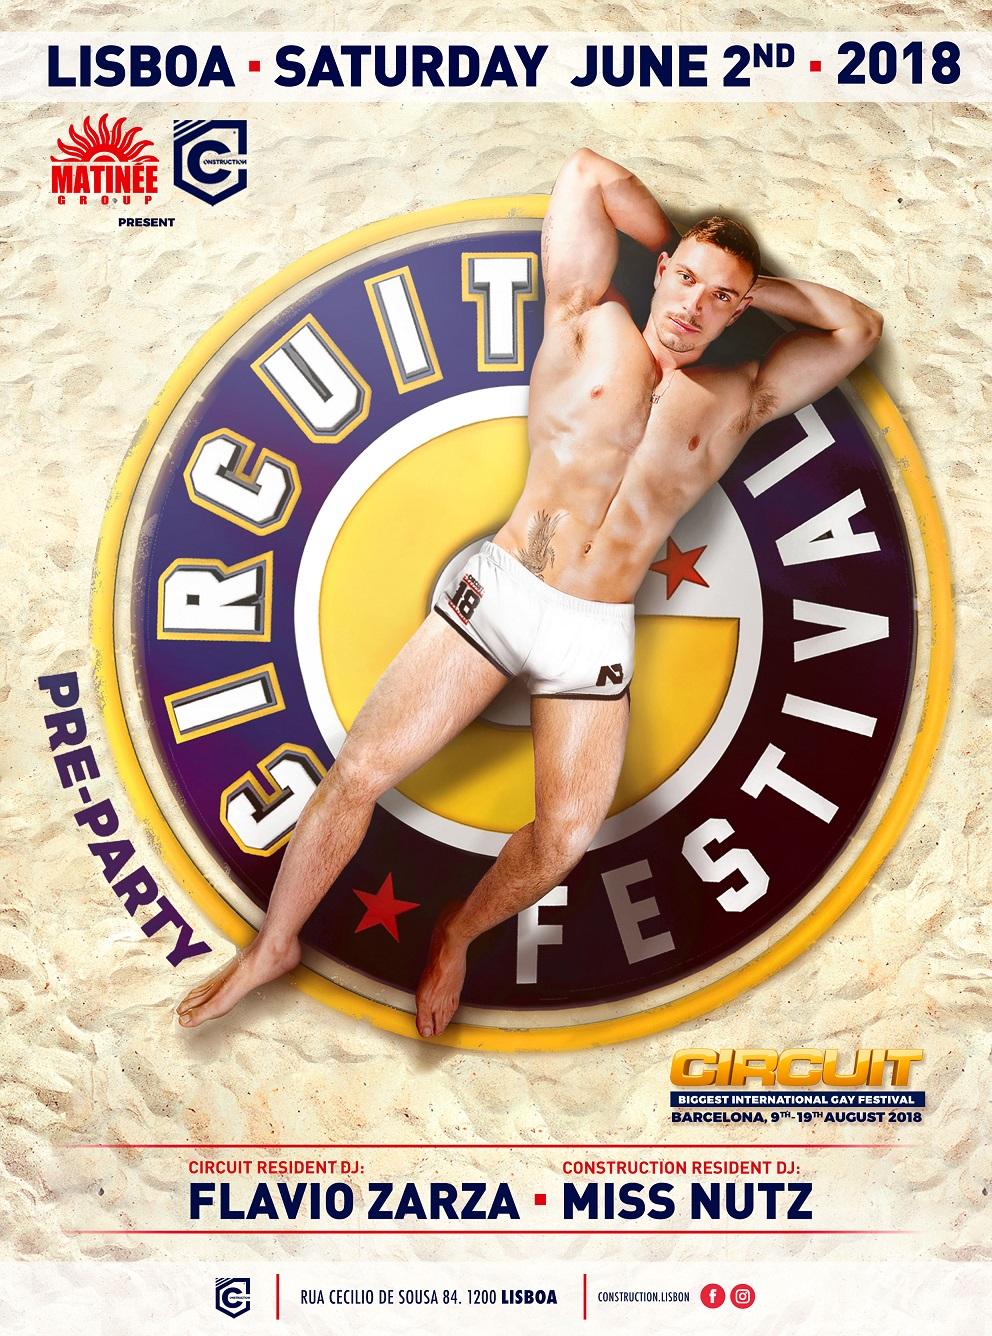 lisboa-circuit-gay-festival-parties-matinee